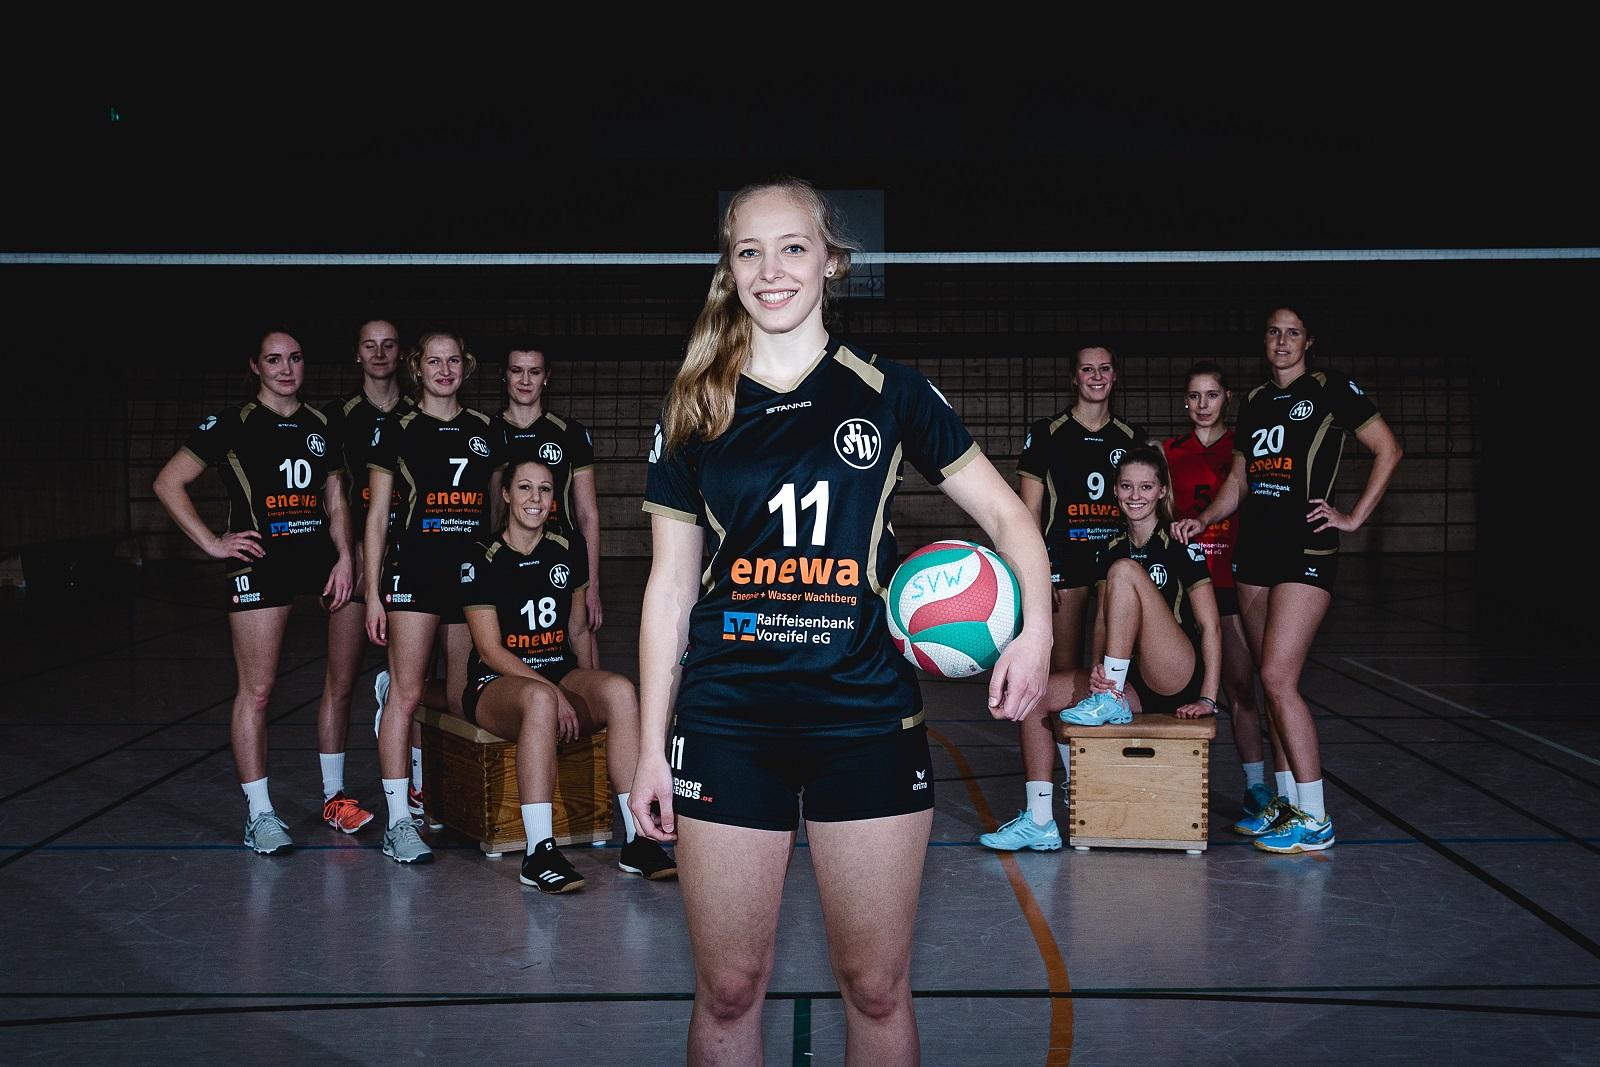 Alina Klevenhaus